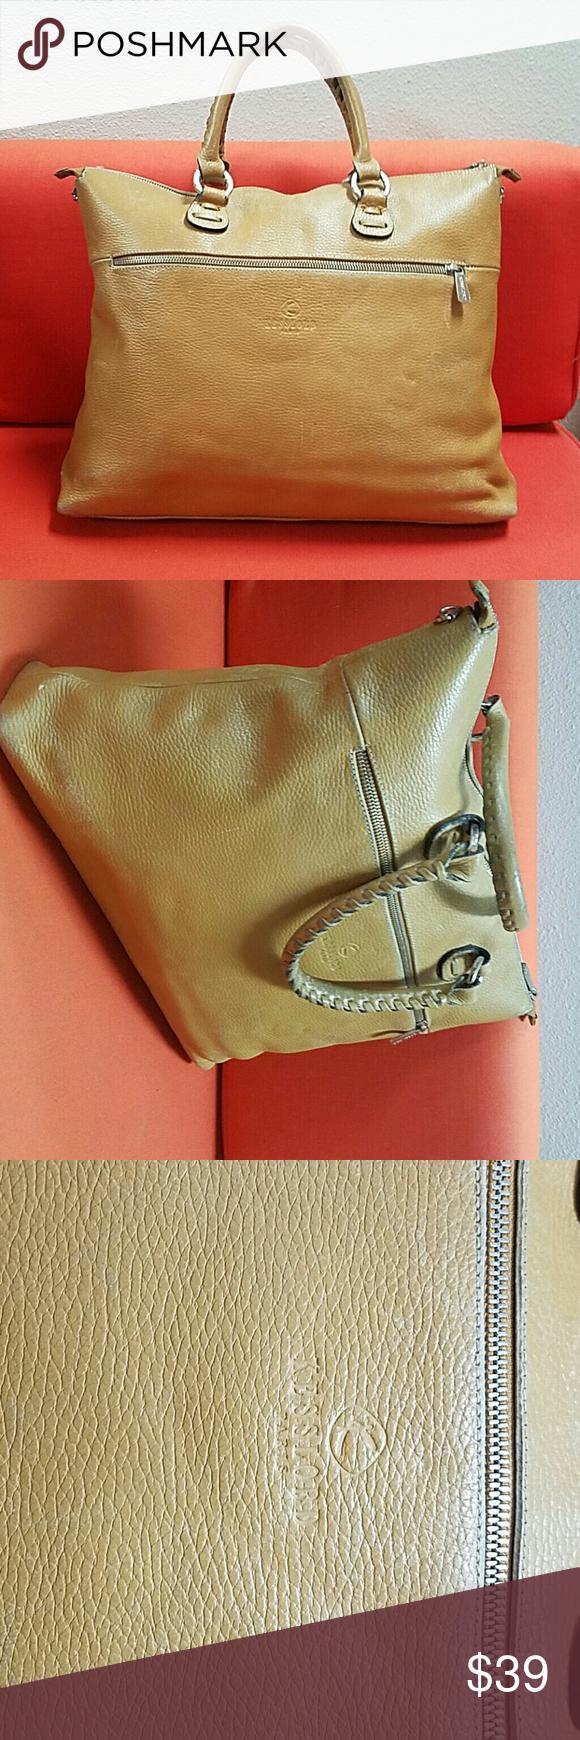 Kesslord Paris France Pebbled Leather Handbag Vtg Made In Large Deluxe Top Handle Bag